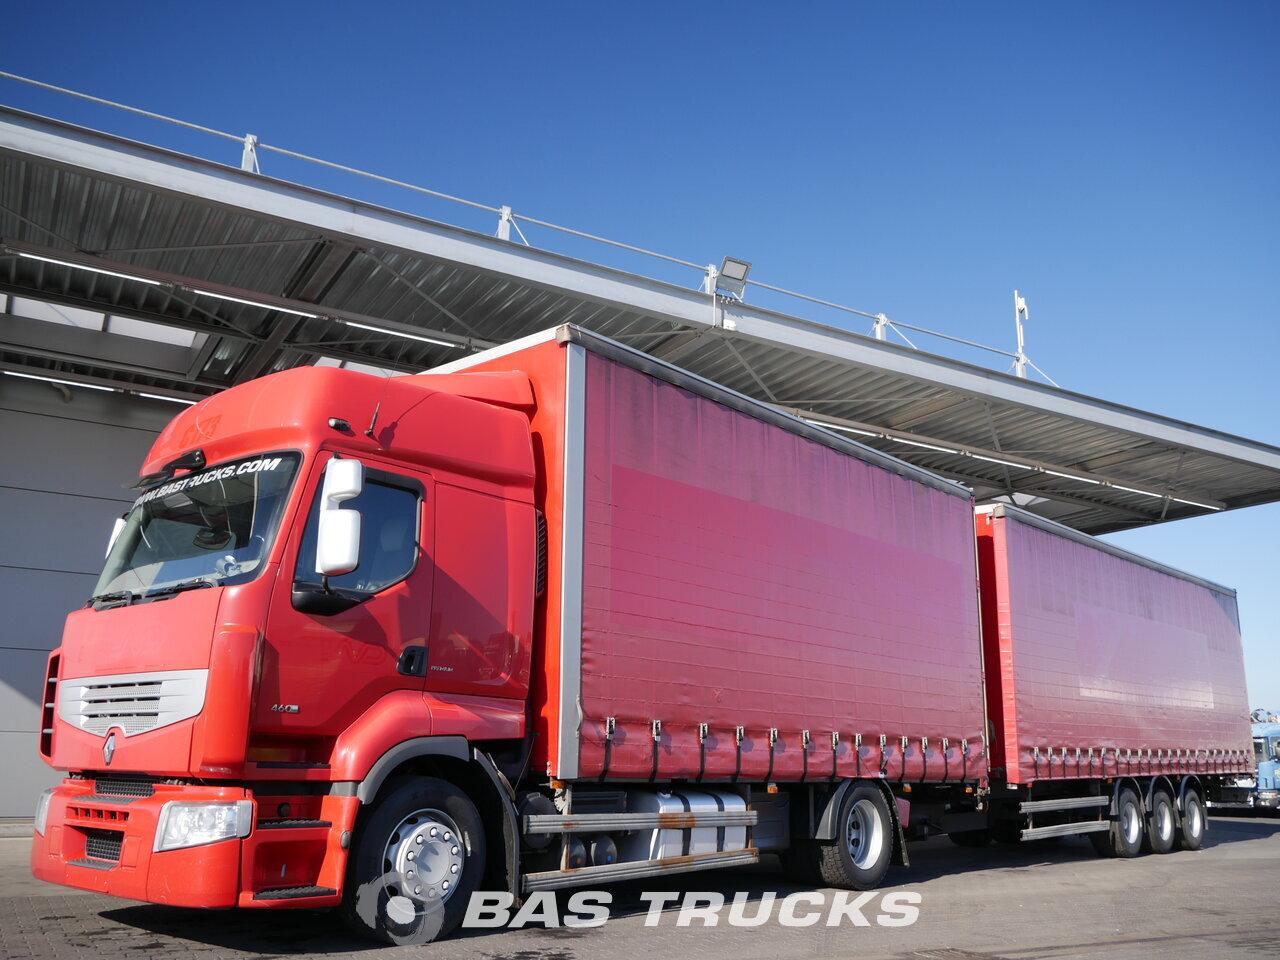 renault premium 460 lkw anhaenger euro 5 20300 bas trucks. Black Bedroom Furniture Sets. Home Design Ideas